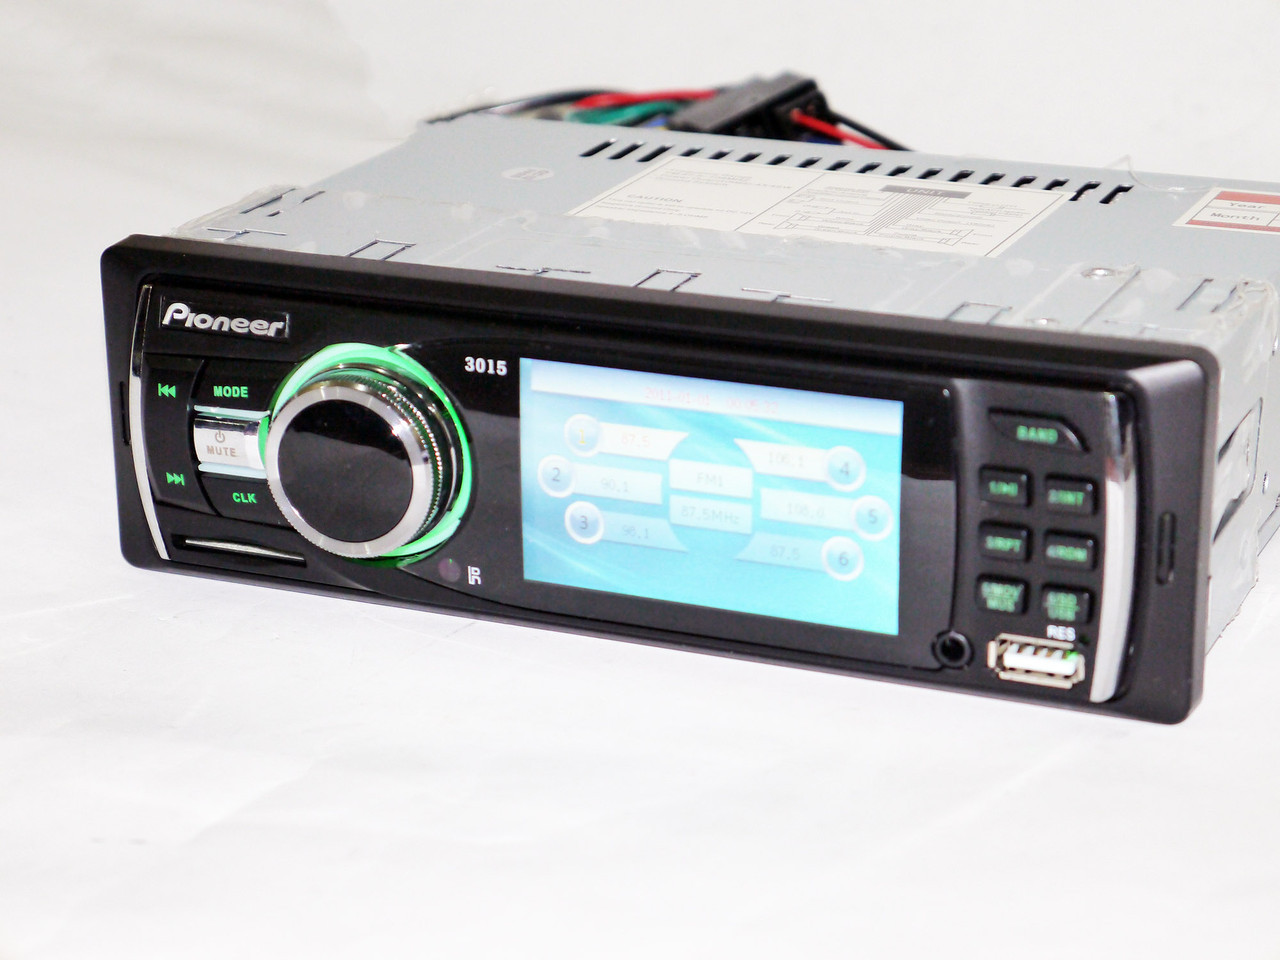 "Автомагнитола Pioneer 3015 - 3"" TFT DIVX/MP4/MP3"